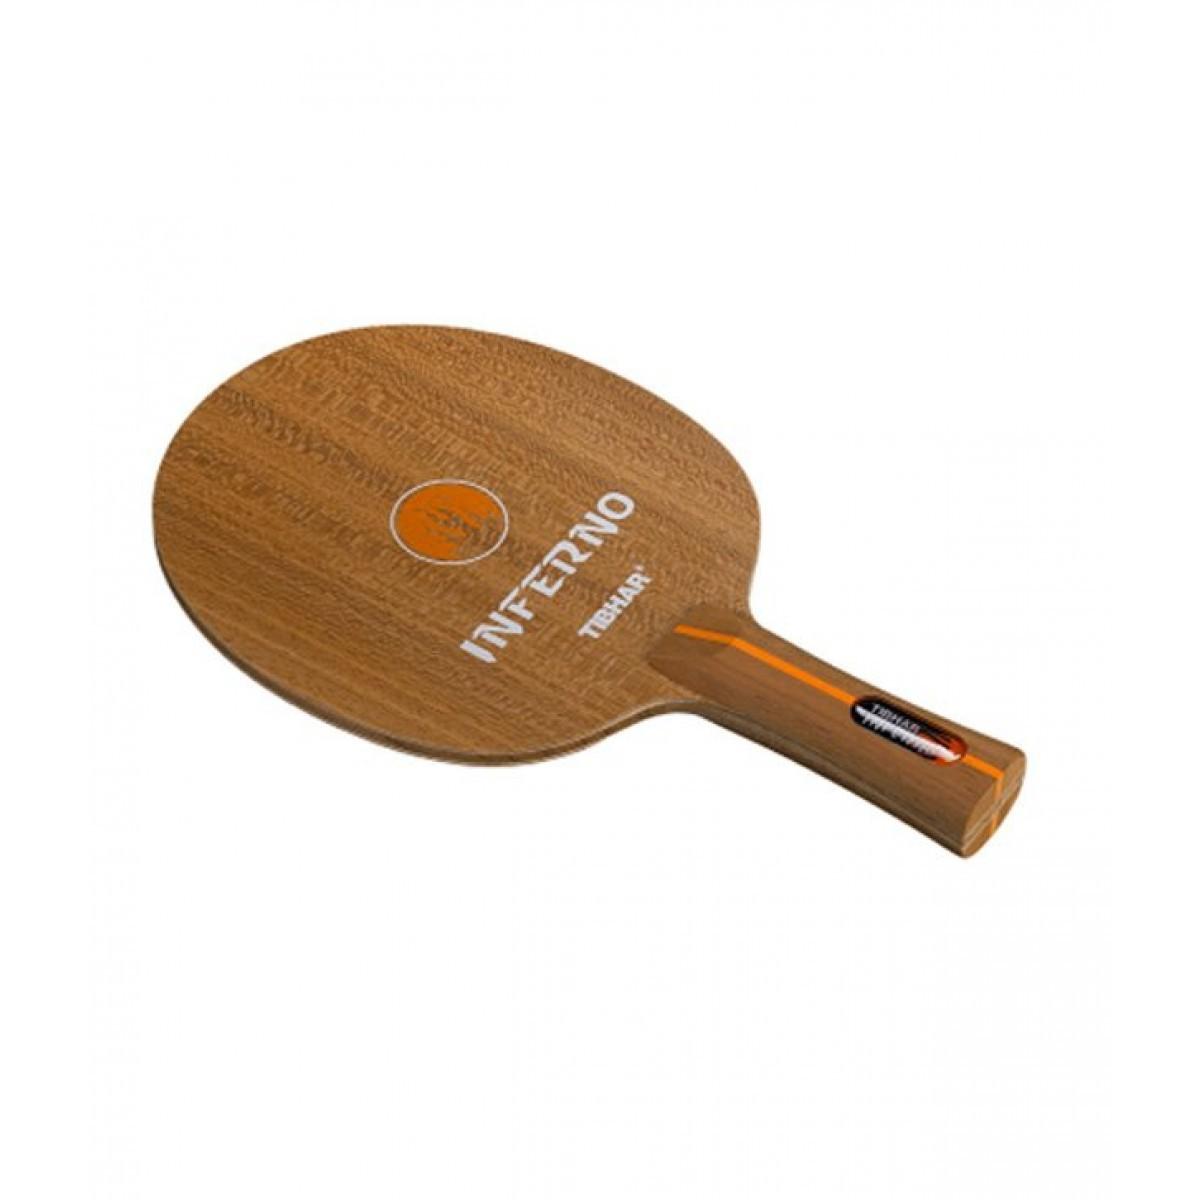 Tibhar Inferno Table Tennis Blade